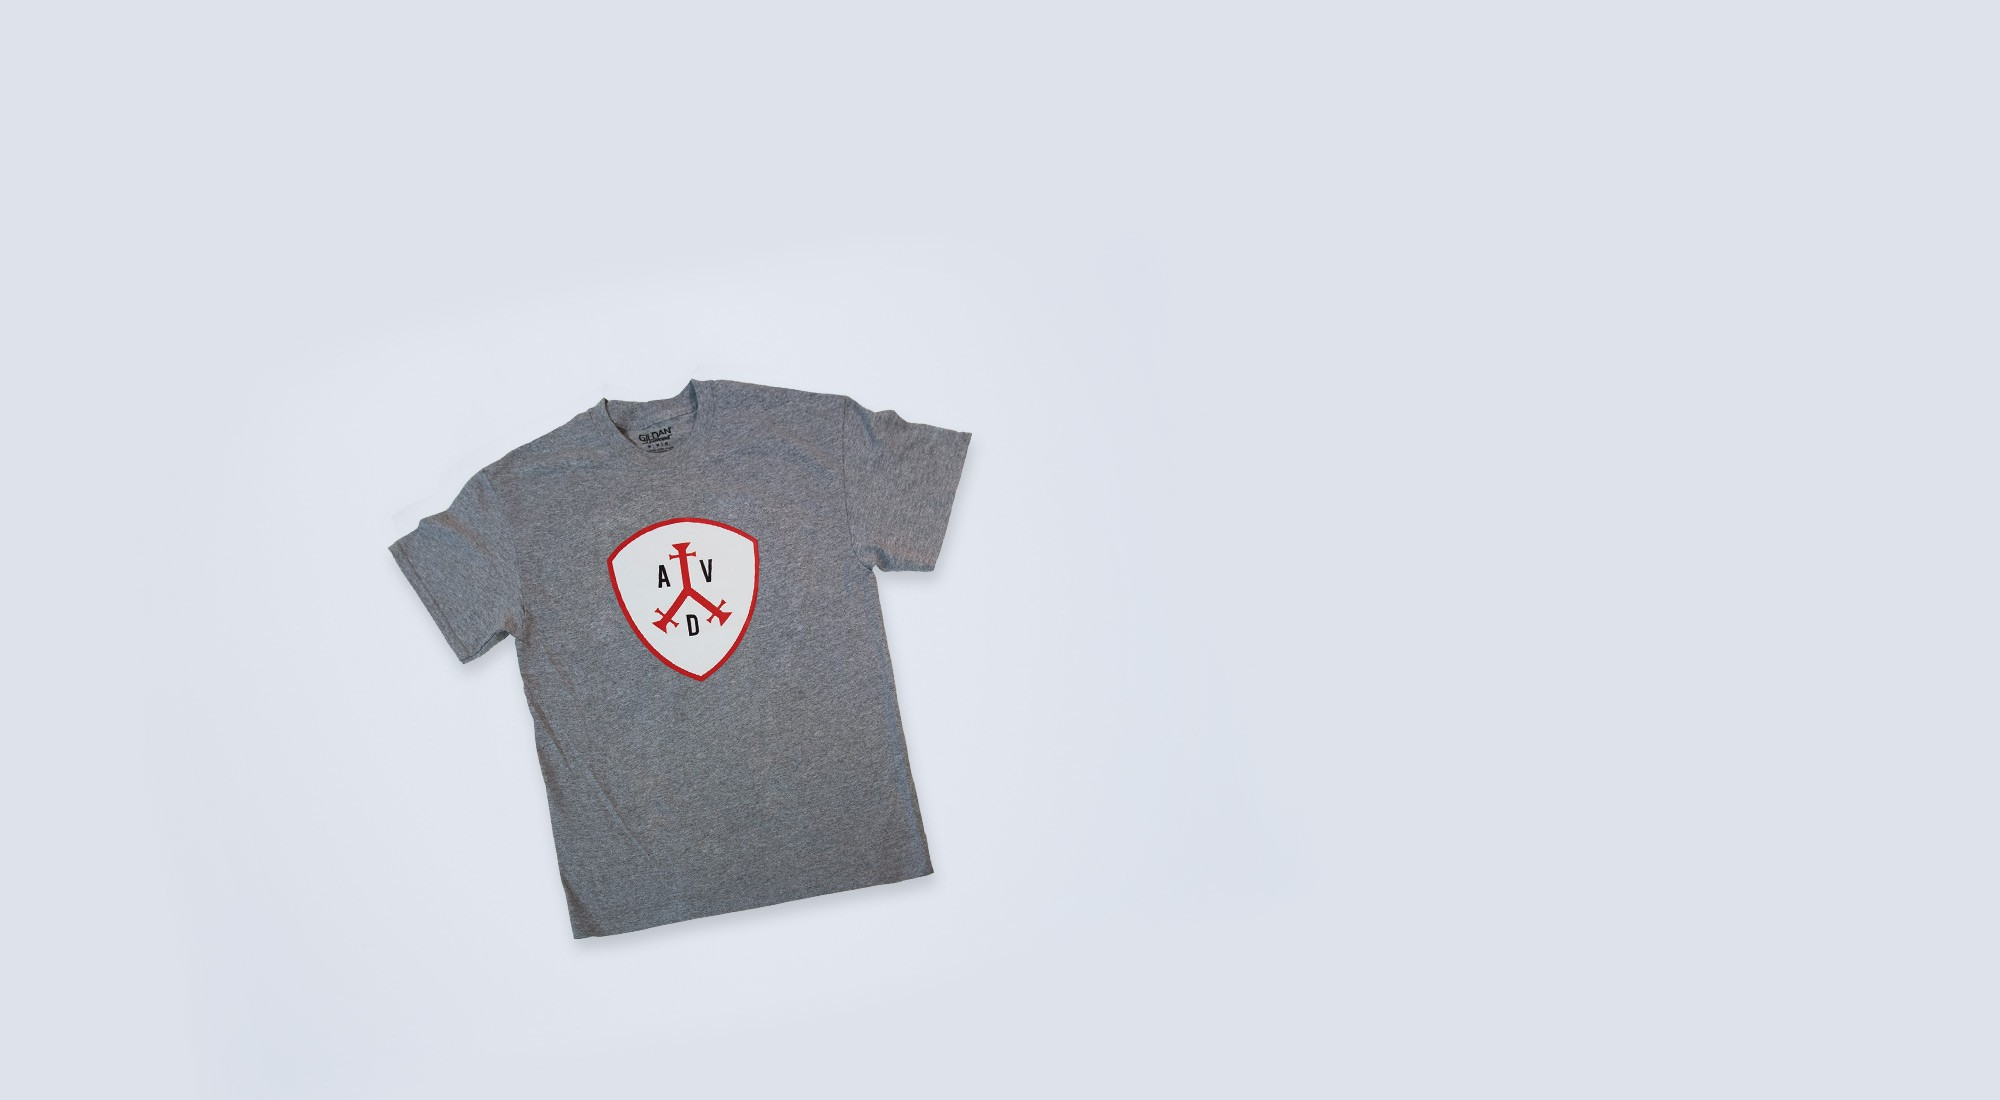 ADV & McKay T-Shirt – The Explorer